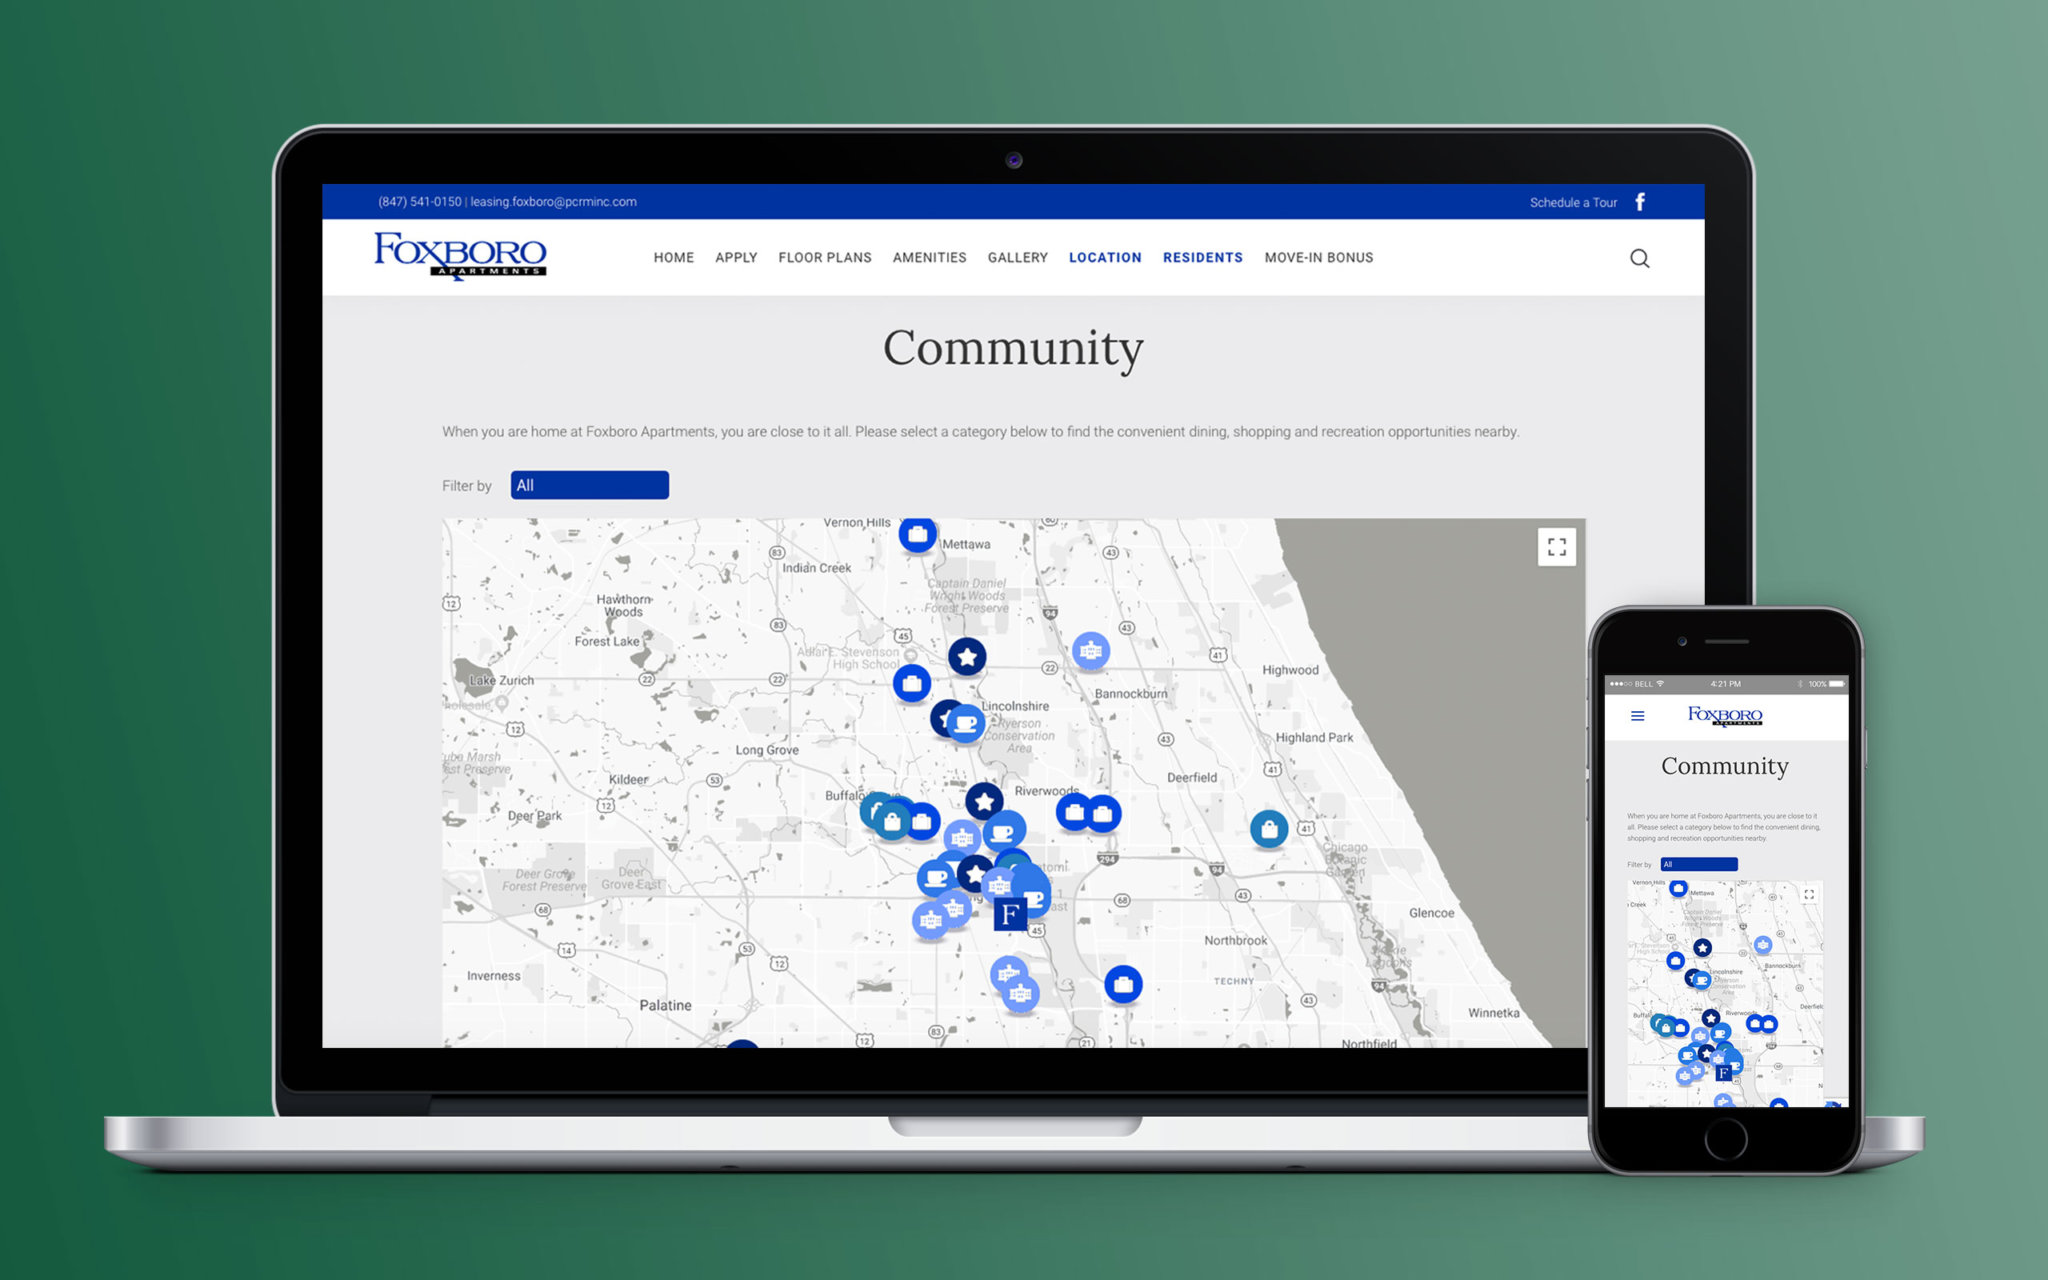 Foxboro Apartments Website Community